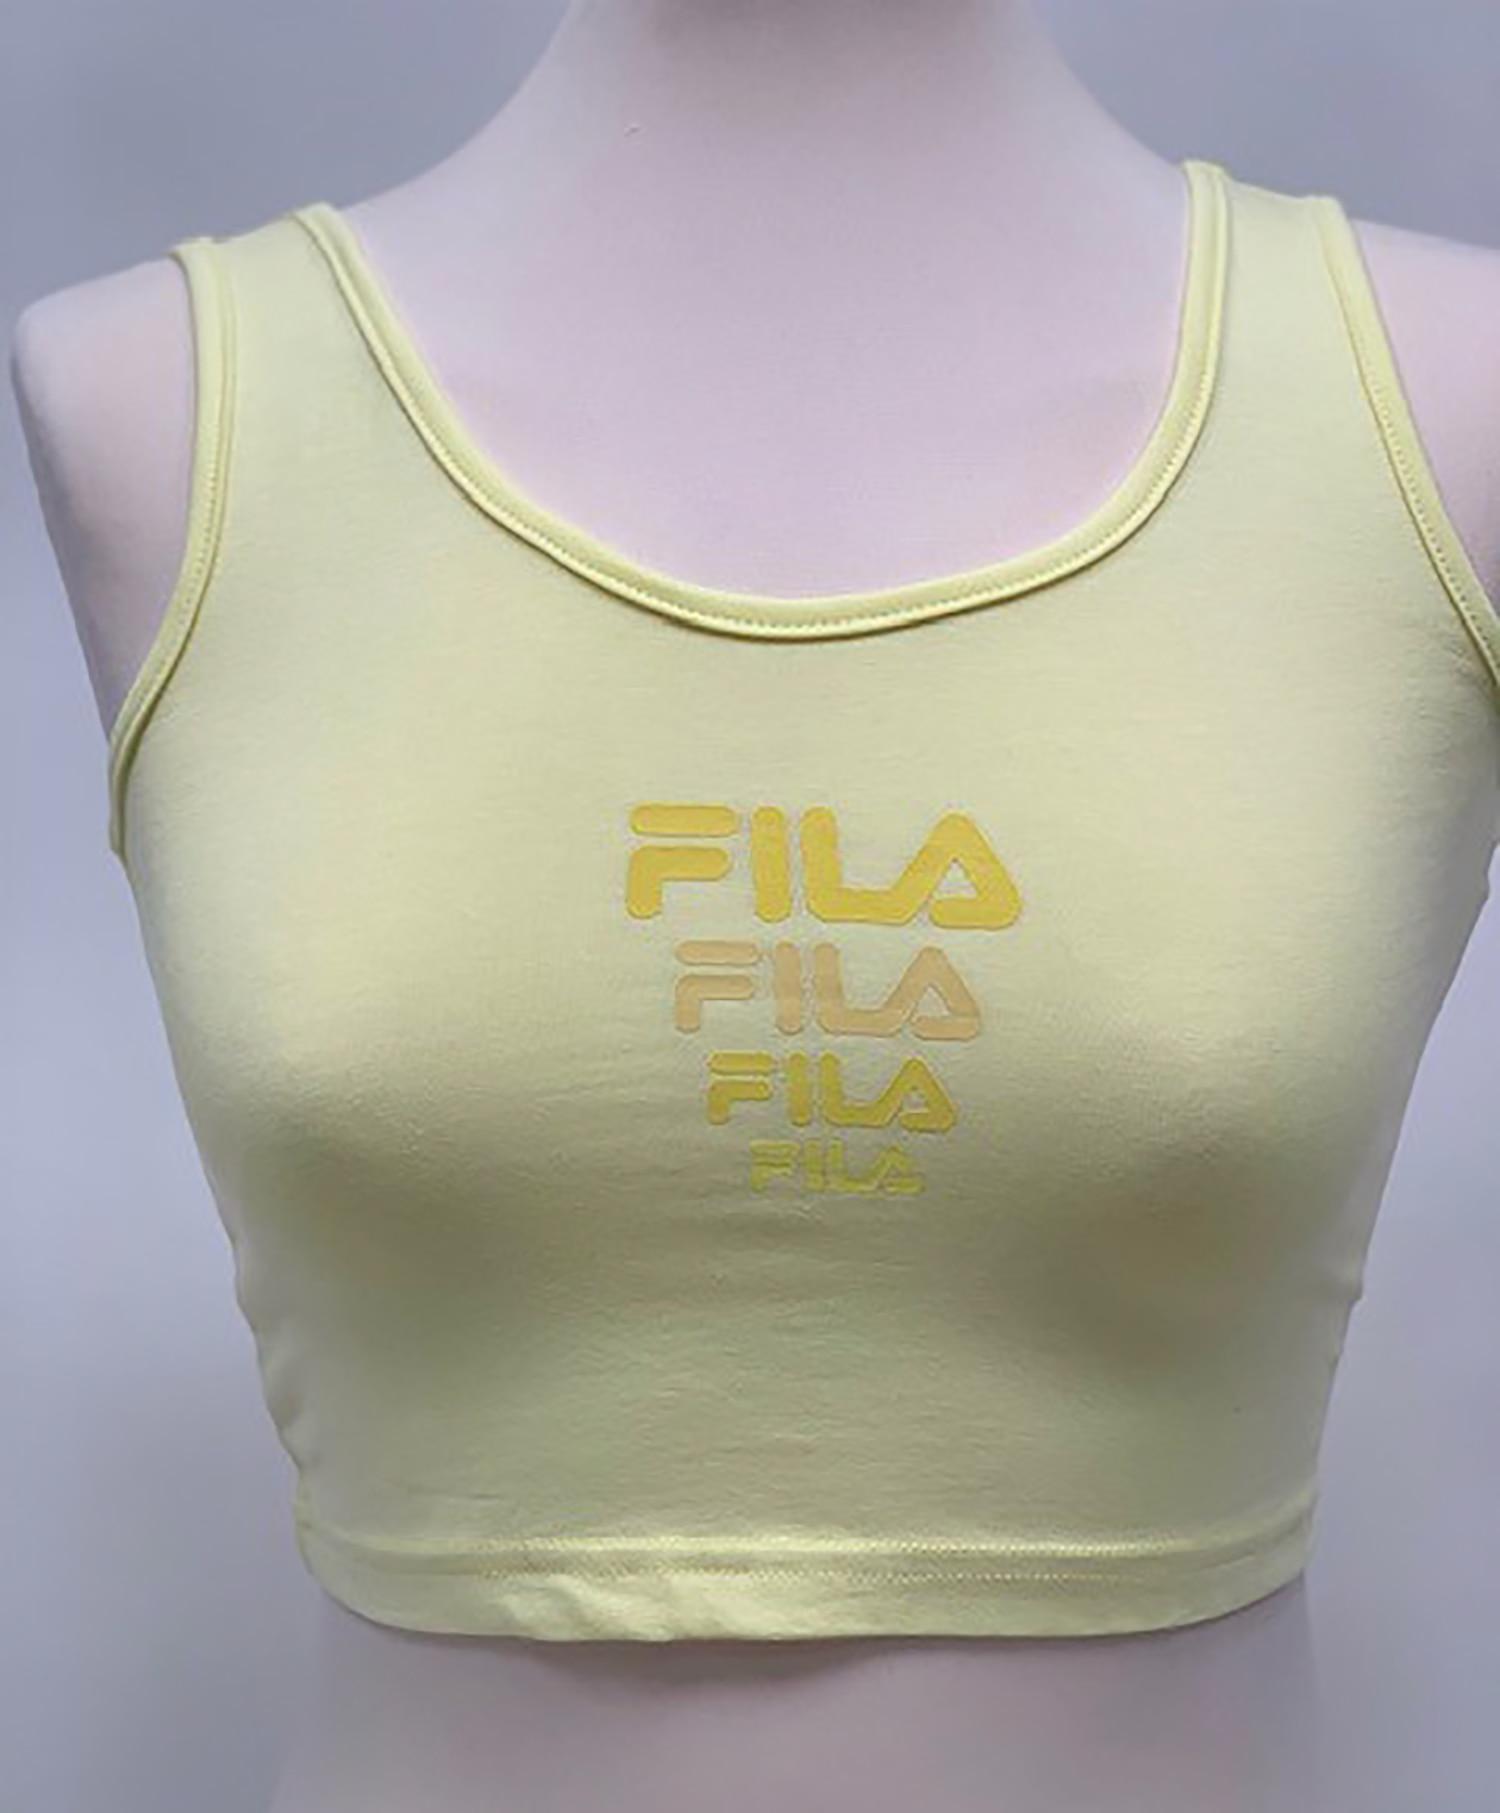 Fila Eliza Cropped top